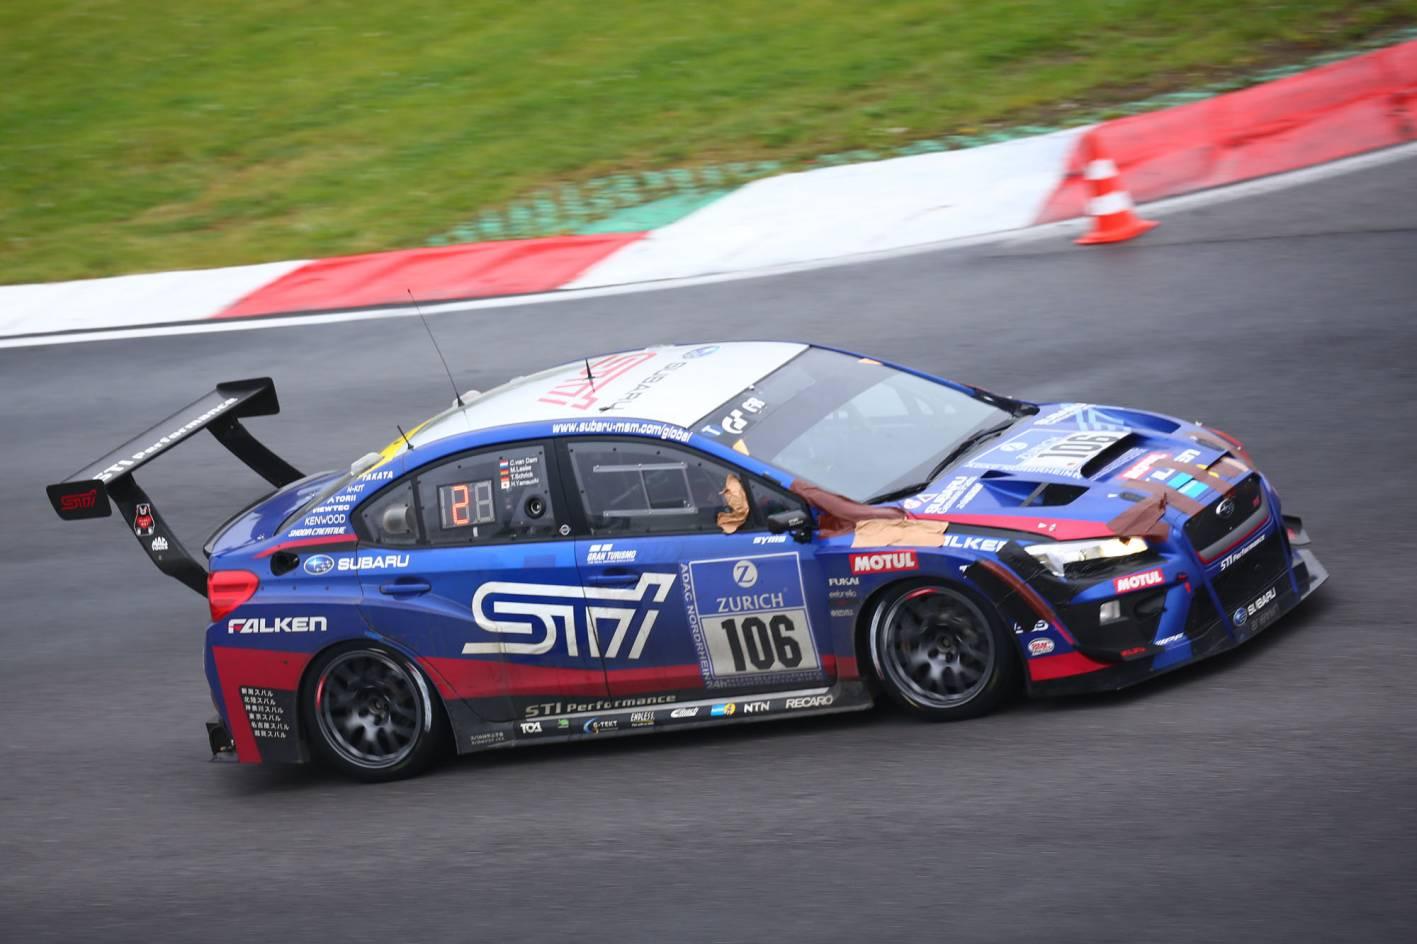 Subaru Wrx Sti Nbr Racer Wins N 252 Rburgring 24h Race